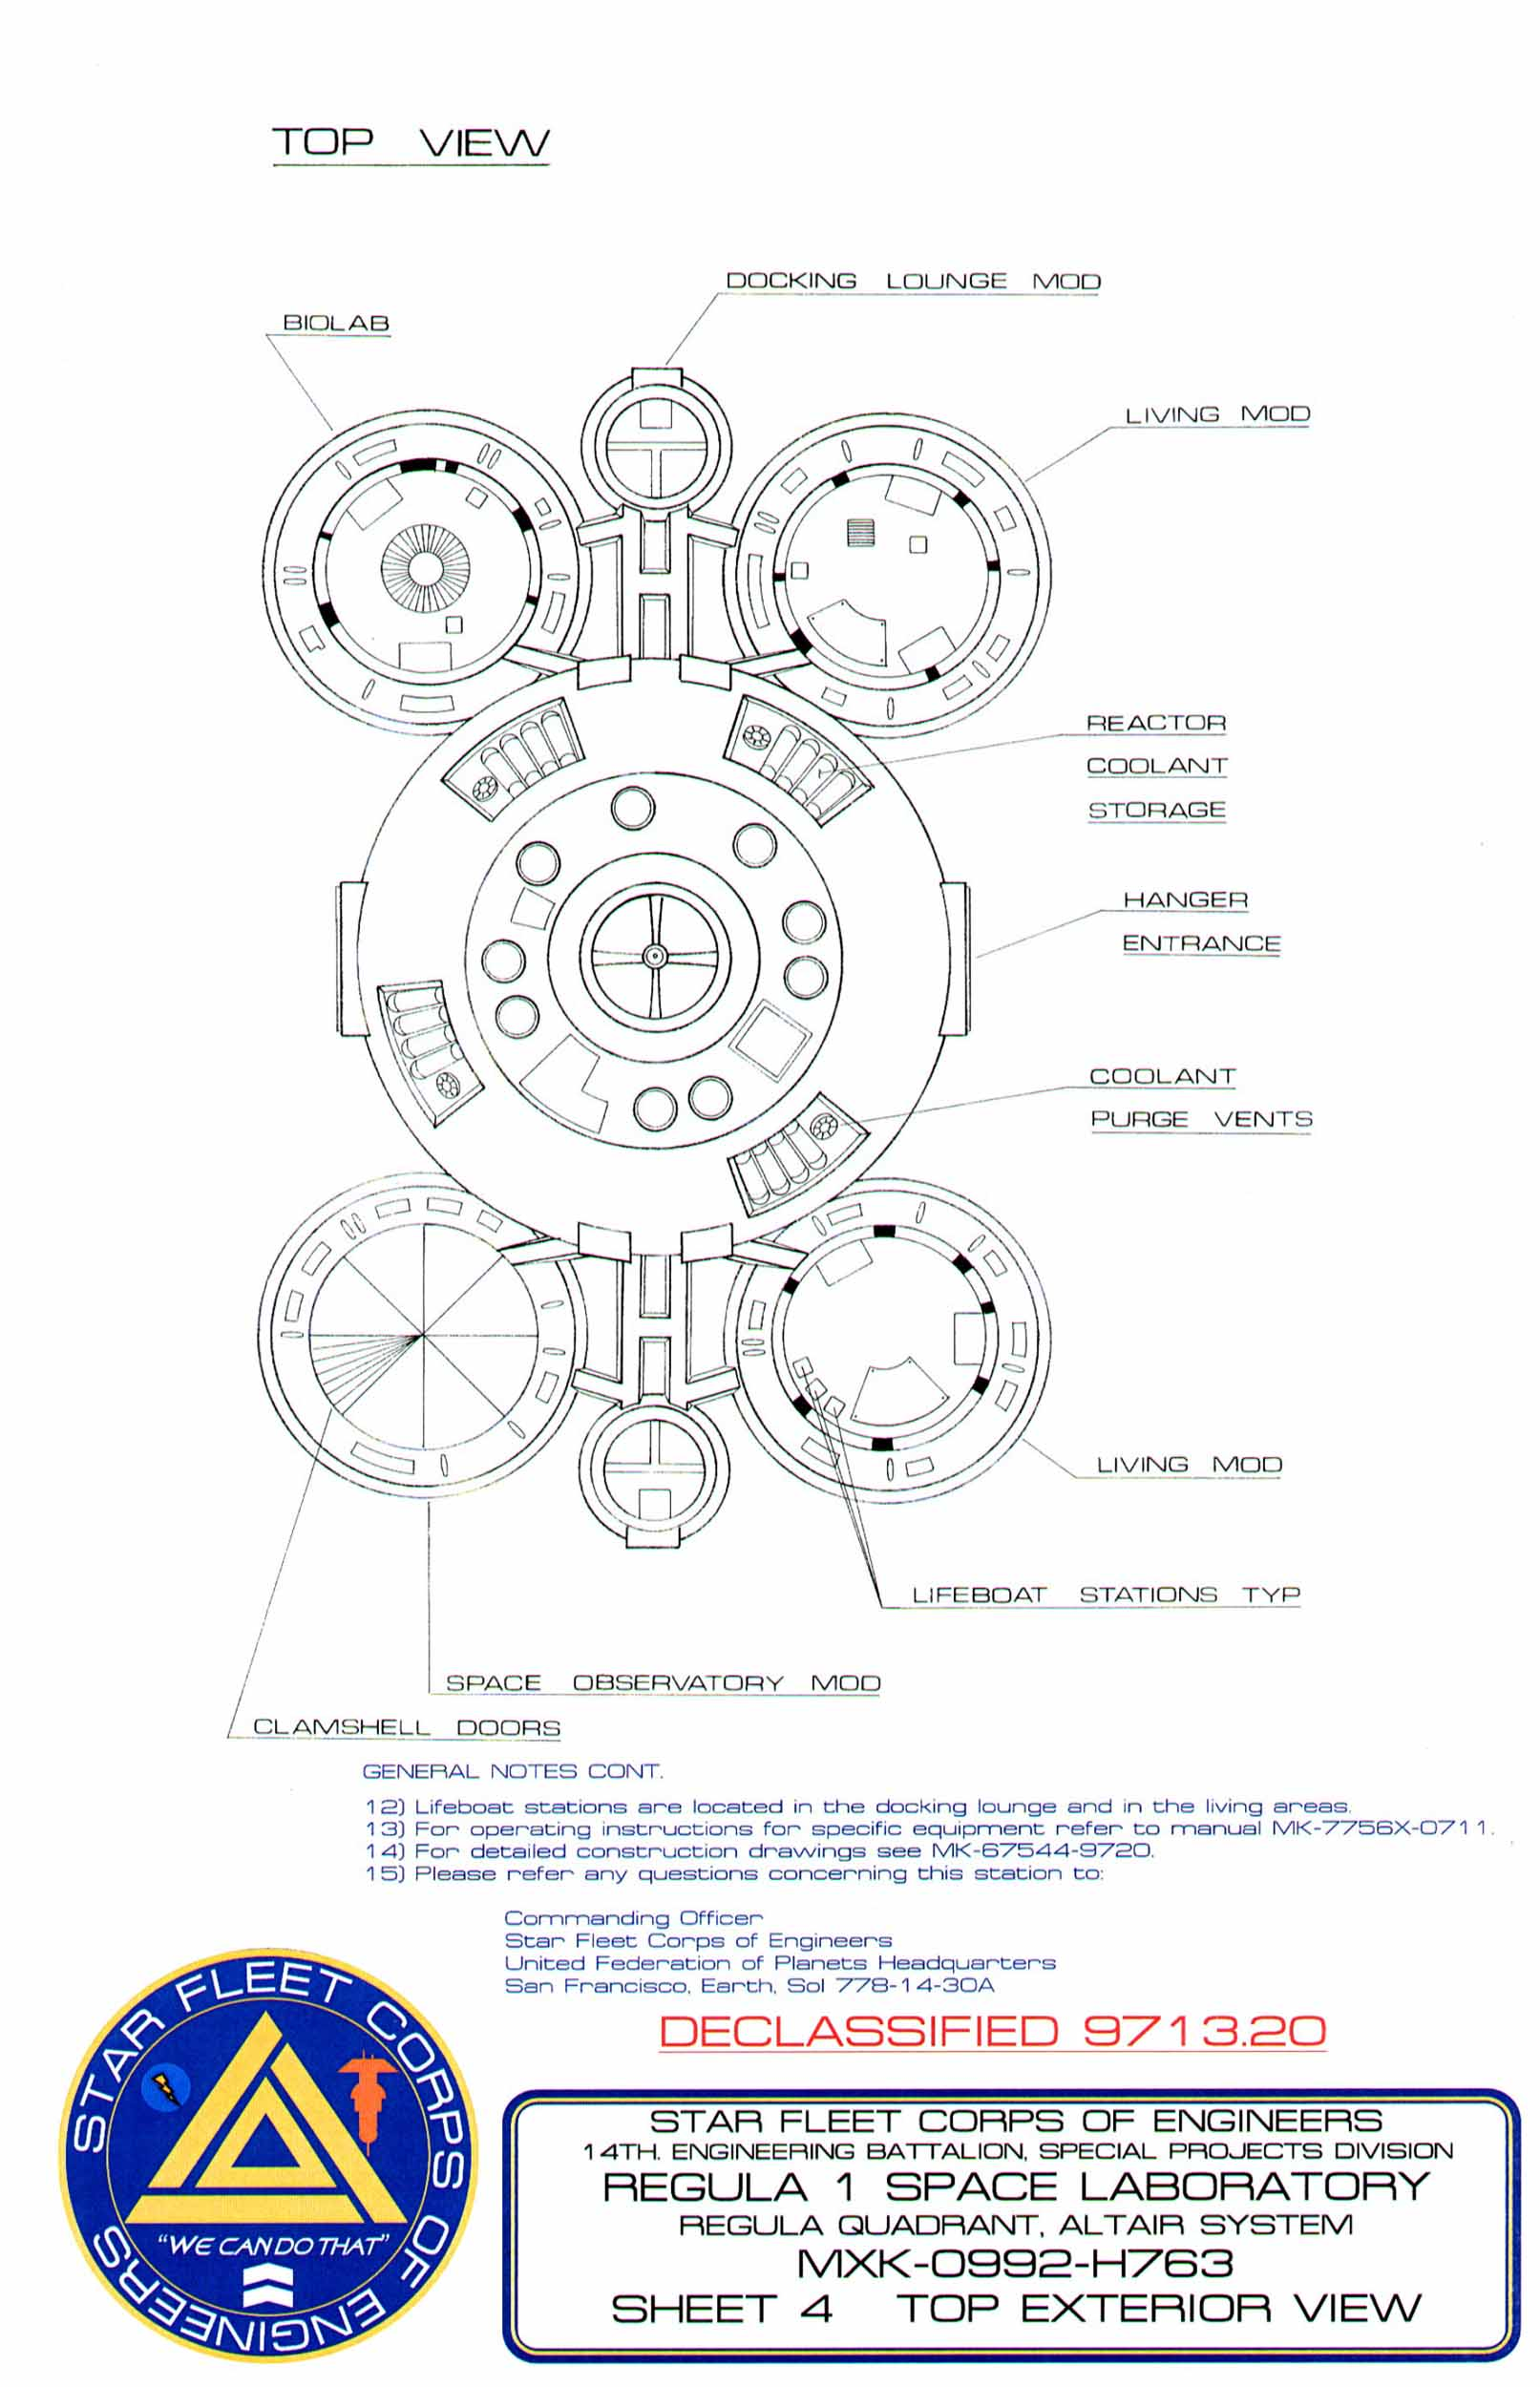 spacelaboratoryregula1sheet4.jpg